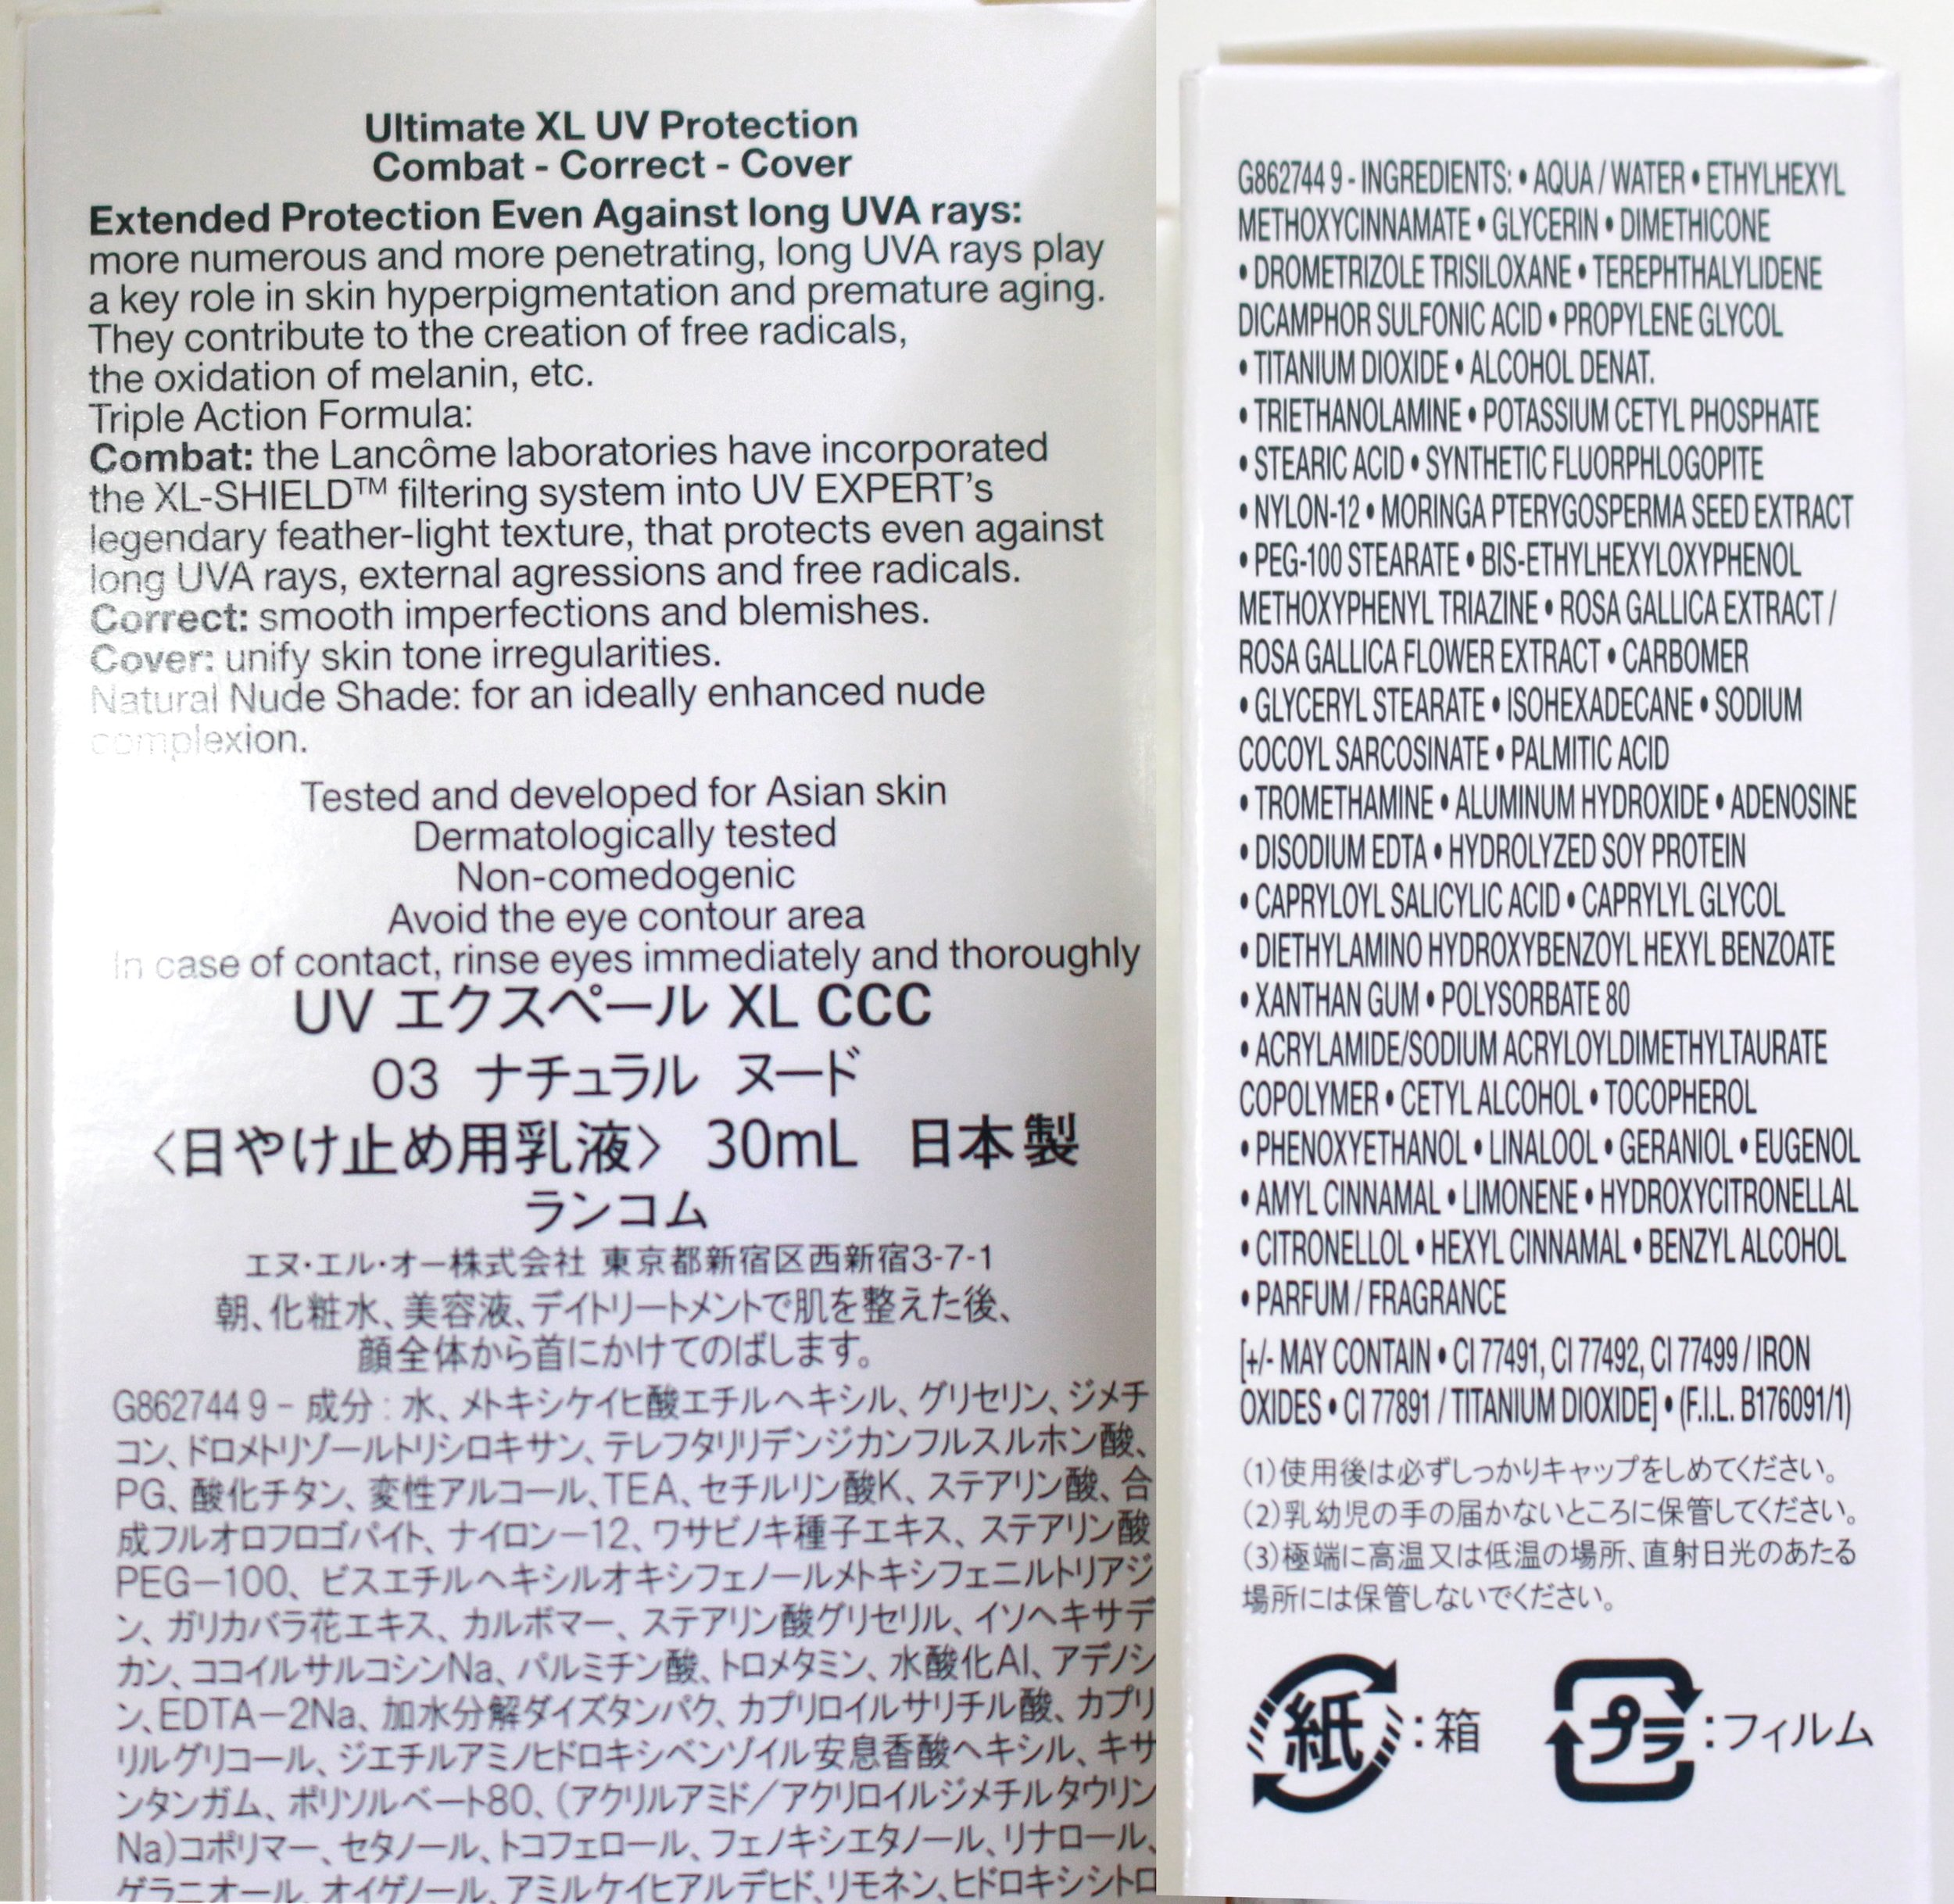 Lancôme UV Expert CC Cover ingredients